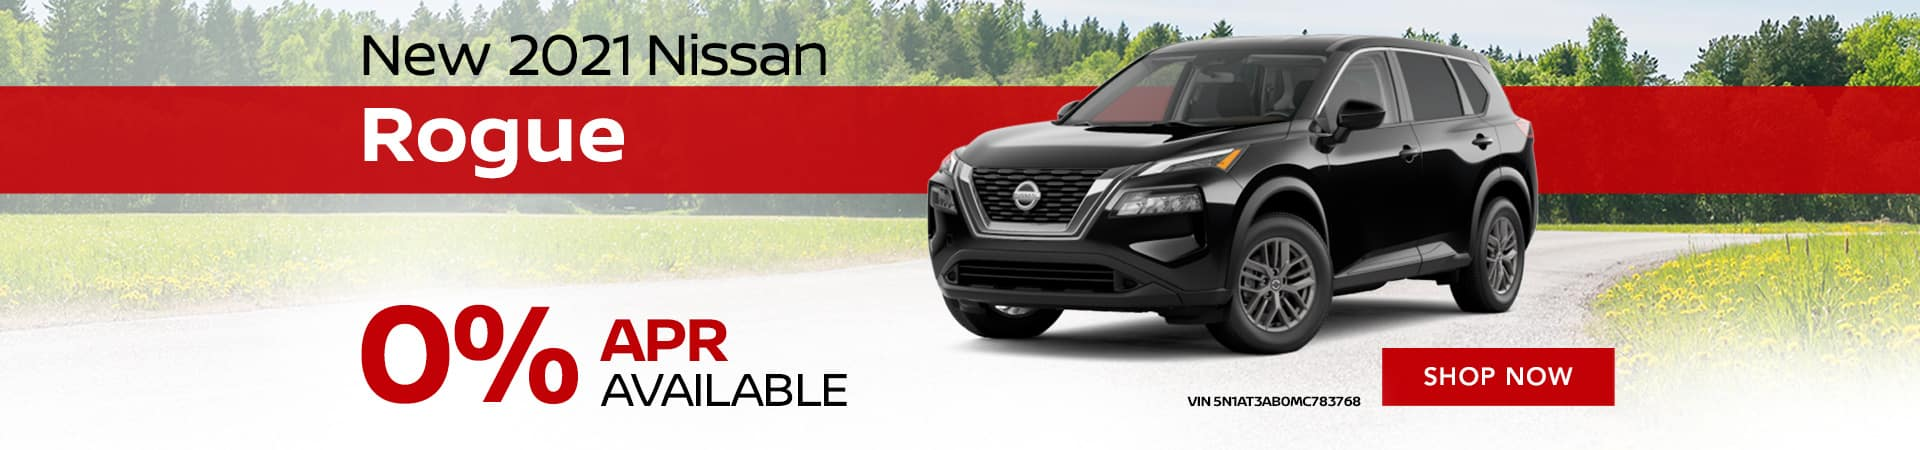 JRN_1920x450_New 2021 Nissan Rogue __07'21